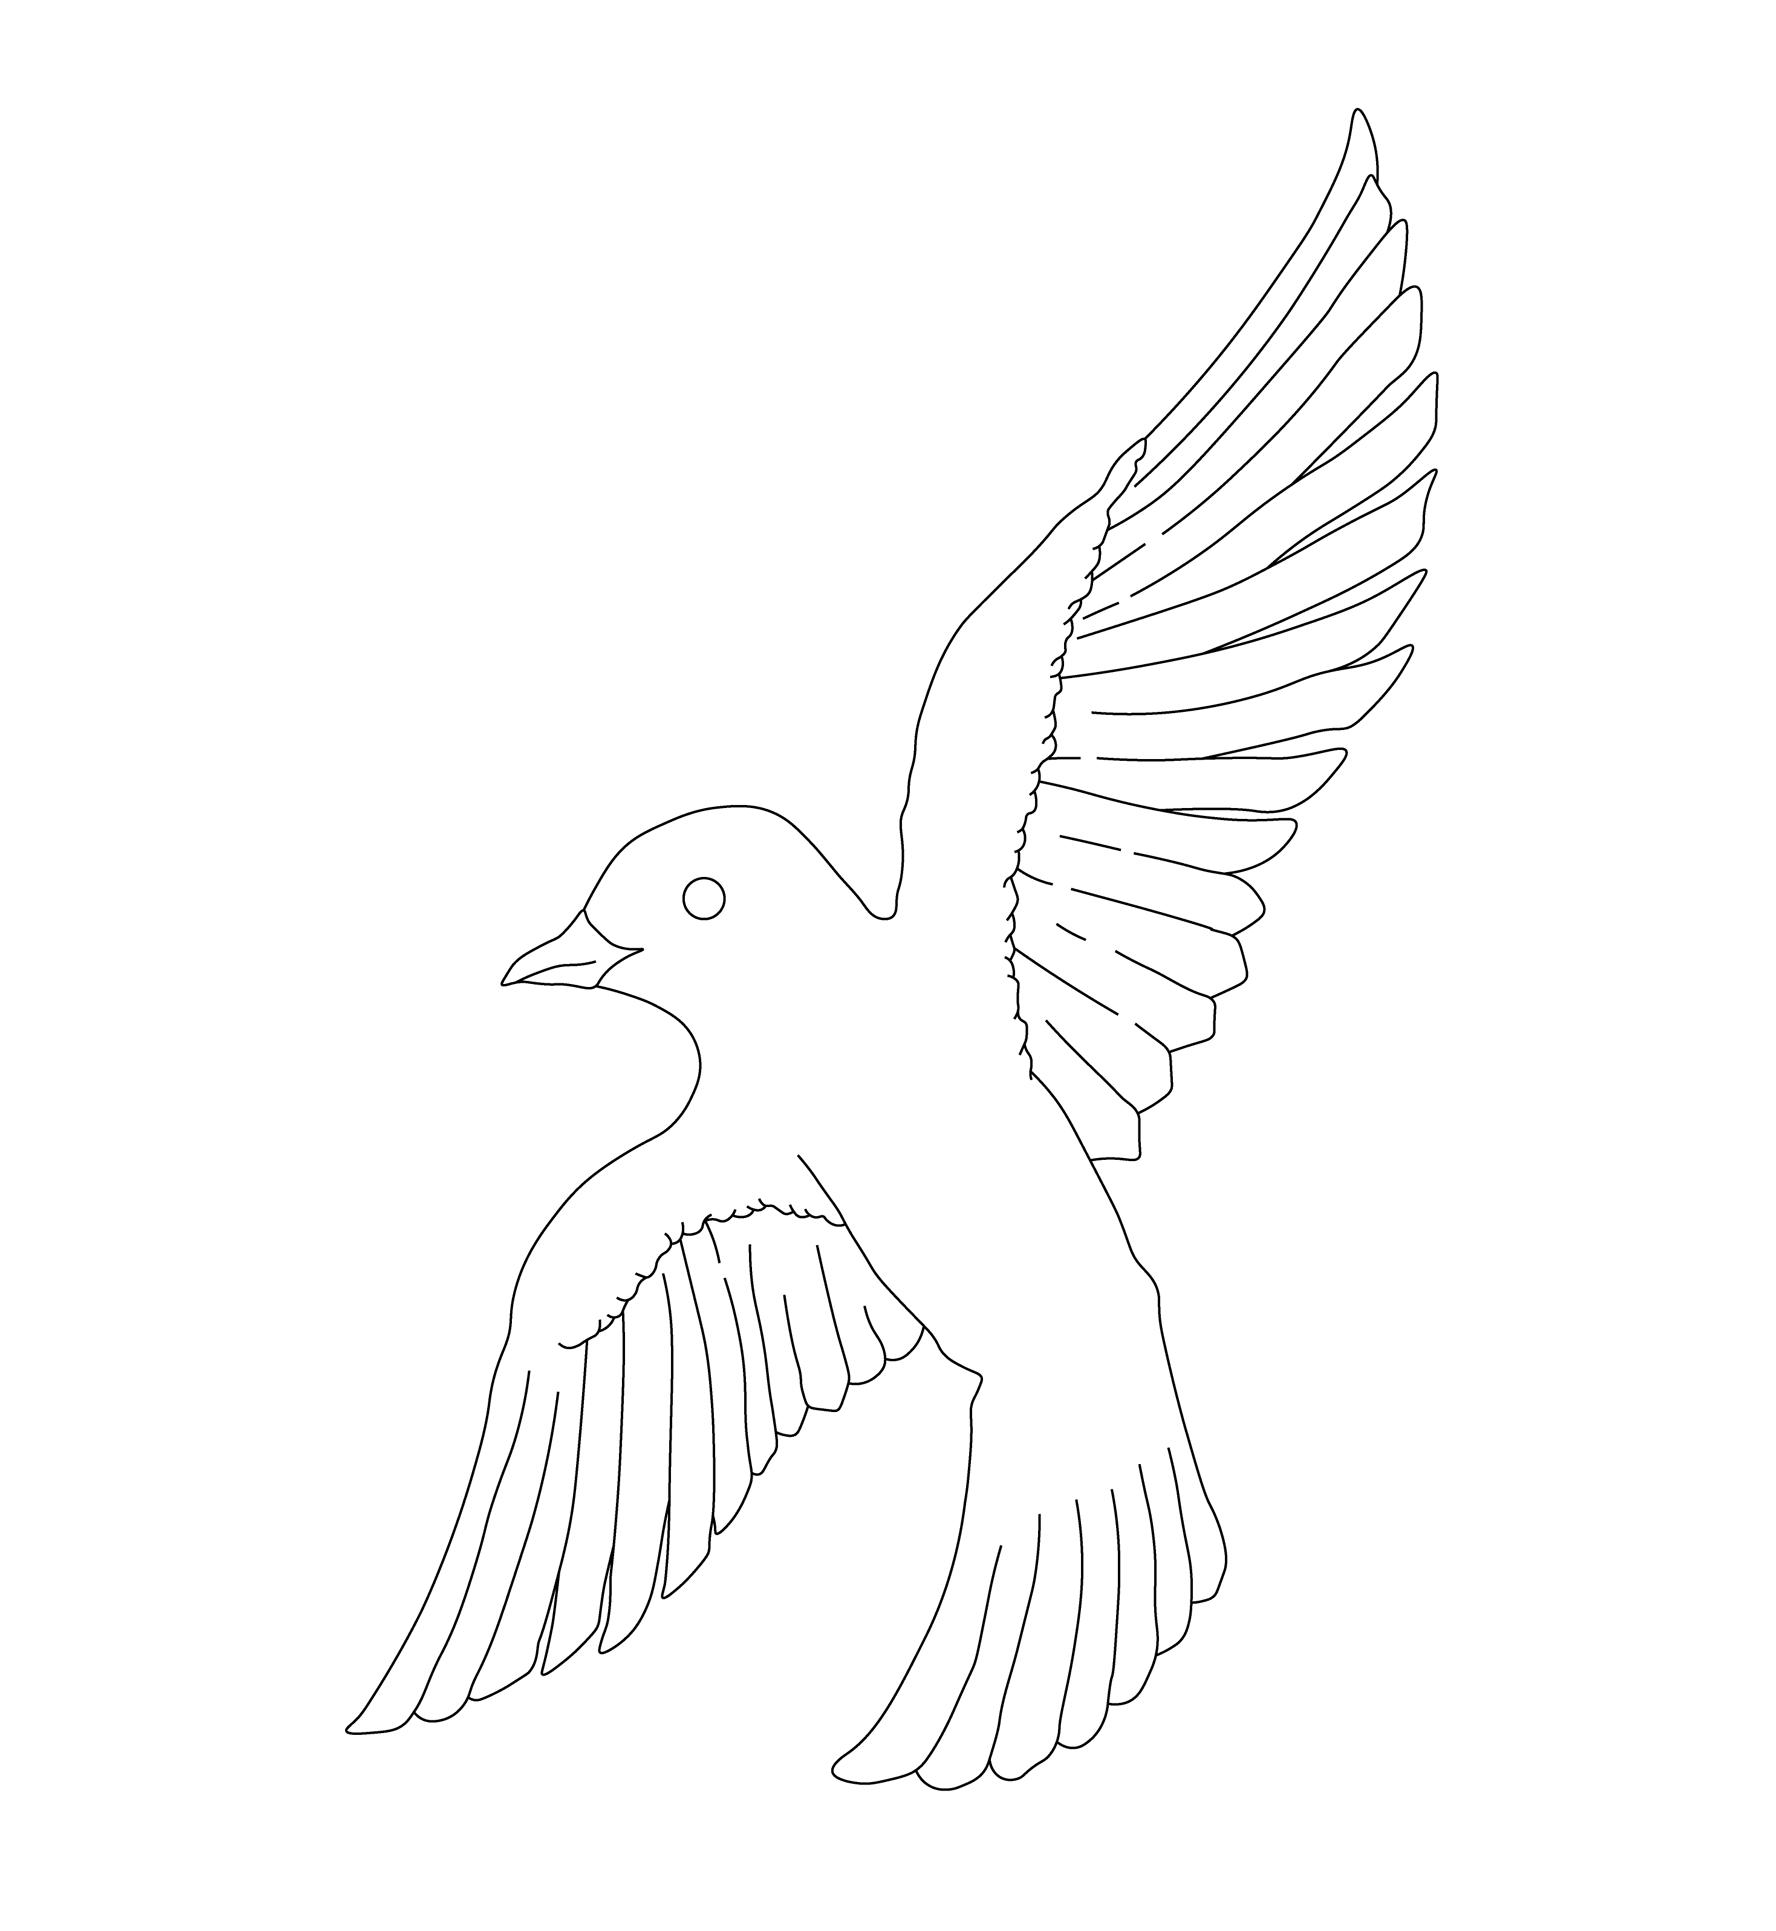 hand-drawn-dove-illustration-1